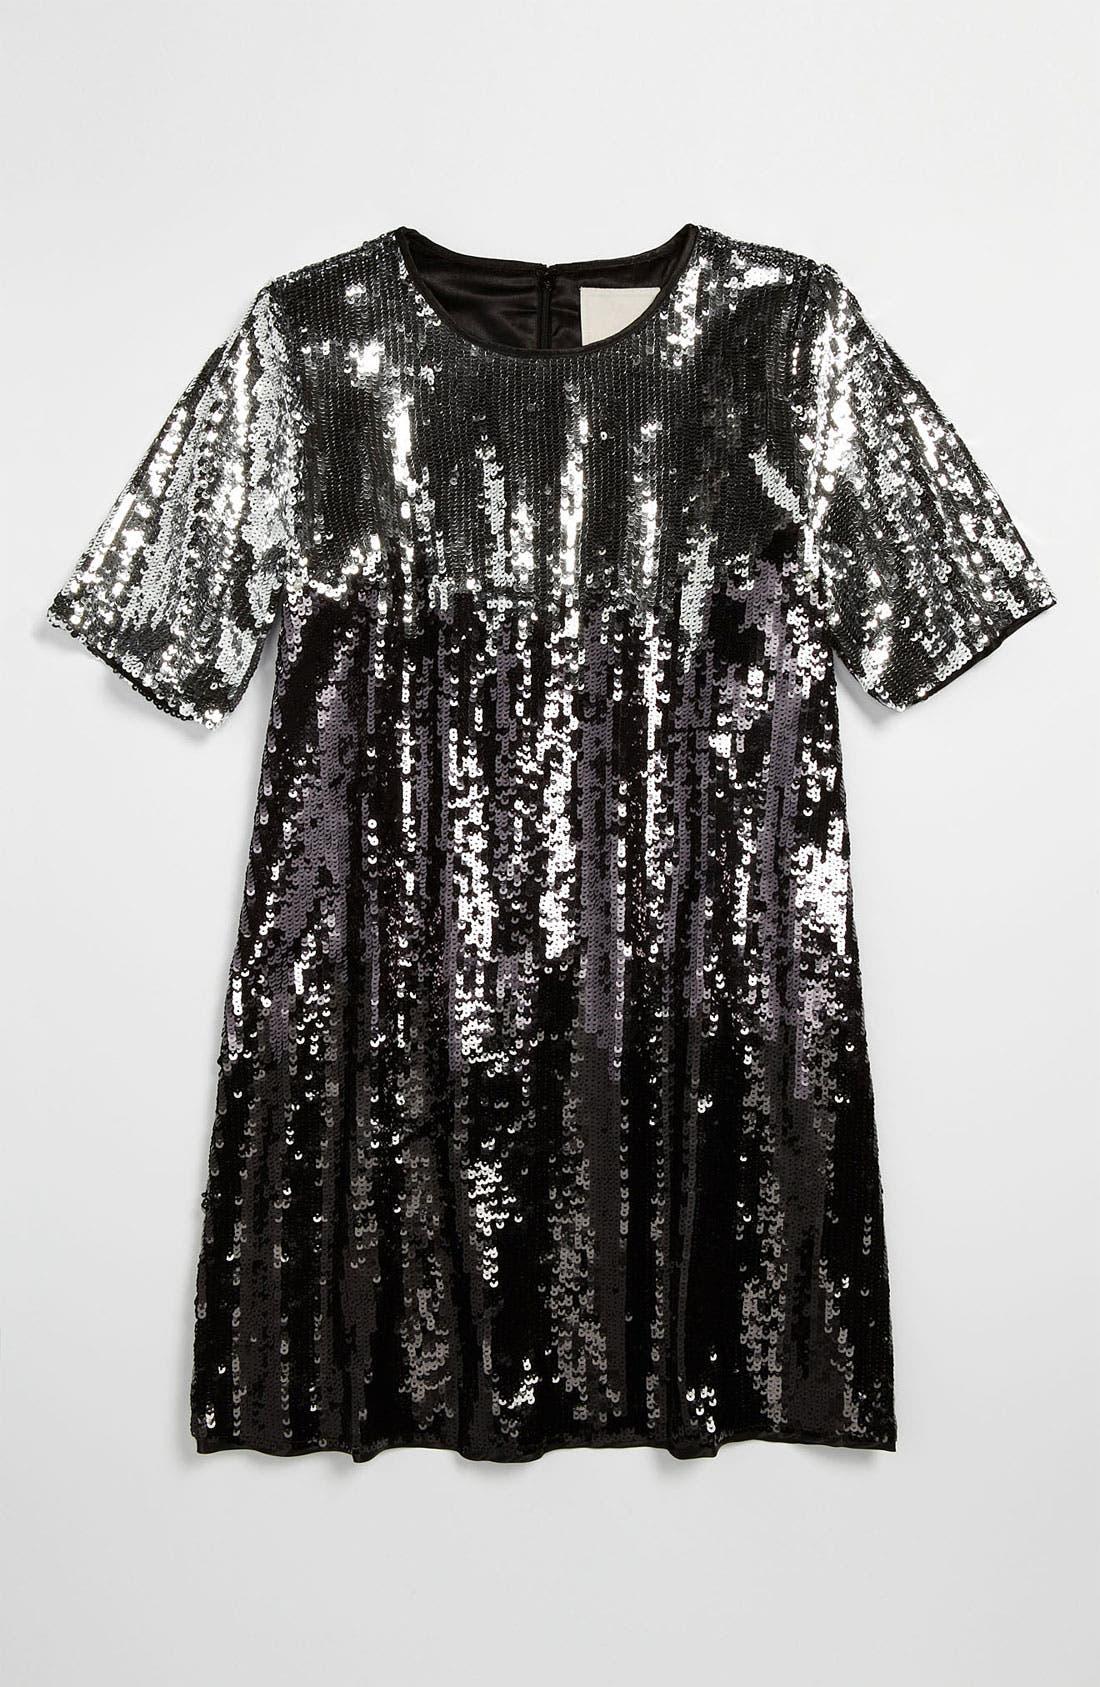 Alternate Image 1 Selected - La Piccola Danza Kidswear Sequin Ombré Dress (Little Girls & Big Girls)